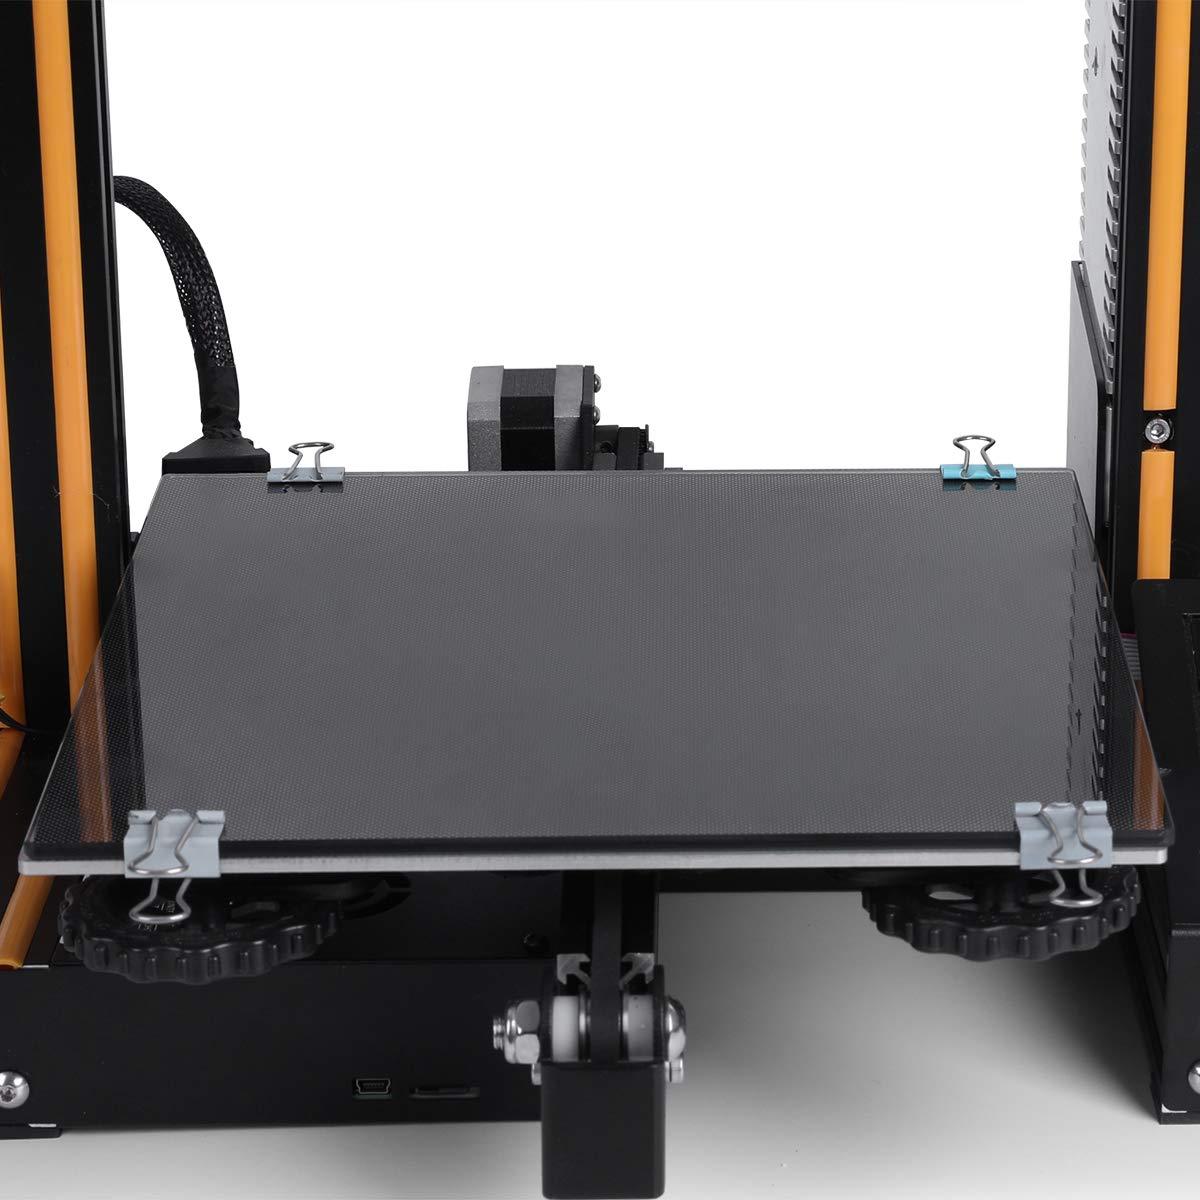 ELEGOO 3D Printer Hotbed Platform, Tempered Glass Plate Surface Heated Bed for Creality Ender 3/Ender 3 Pro Black 235mmx235mmx3mm